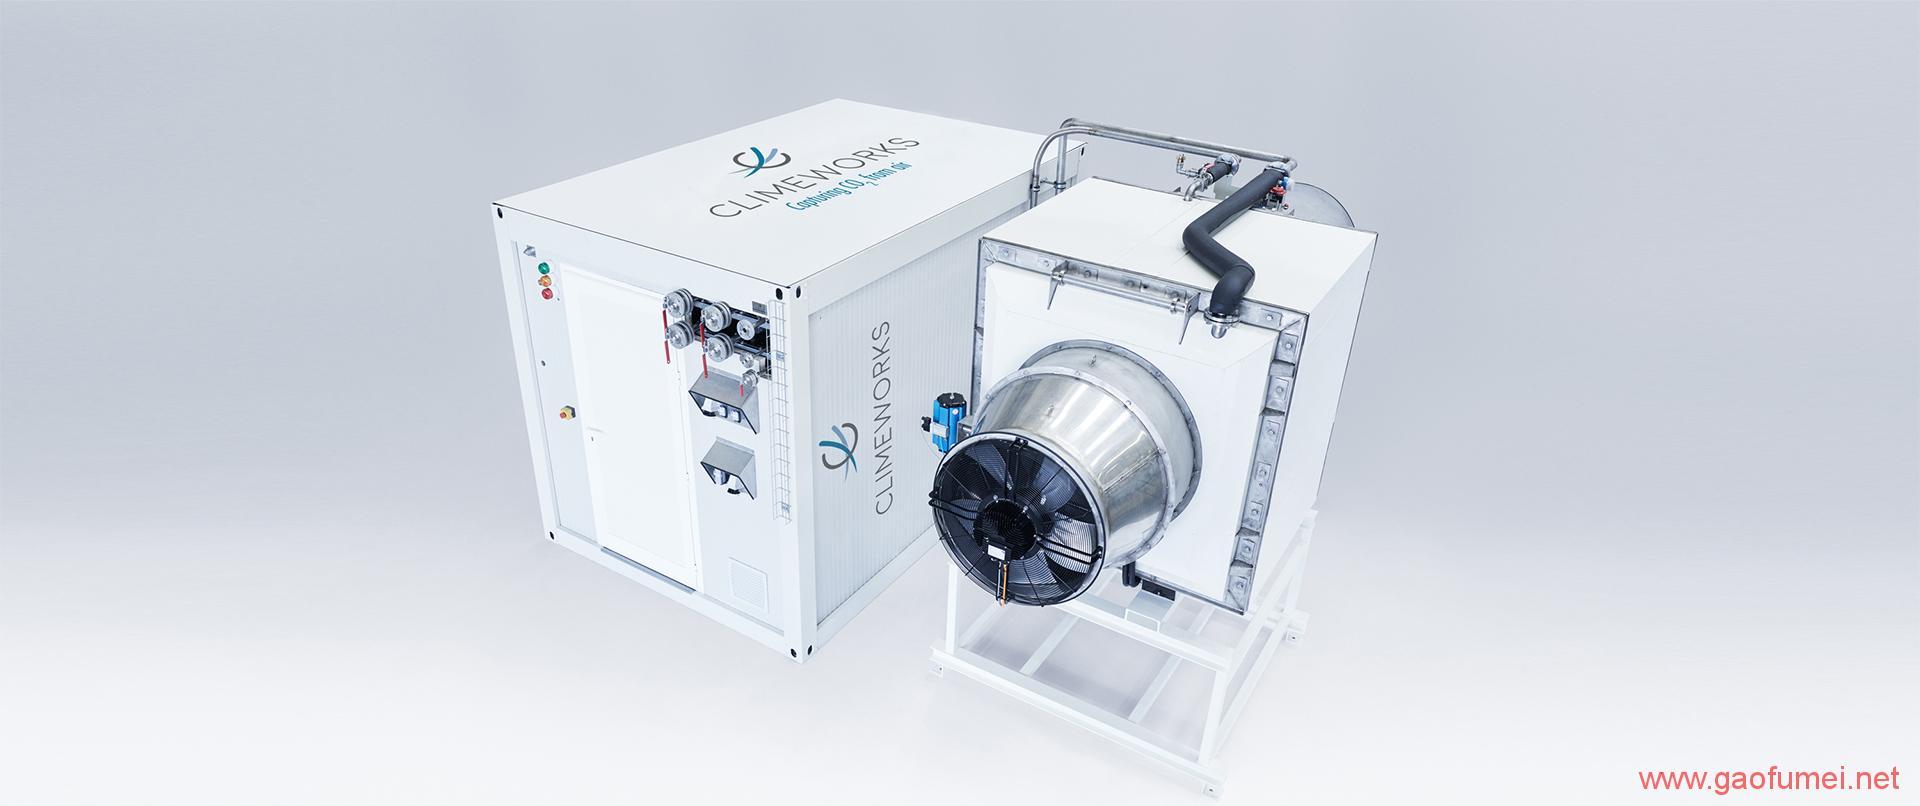 Climeworks发布二氧化碳捕捉设备或将改善全球变暖问题 清洁能源 第1张-泥人传说